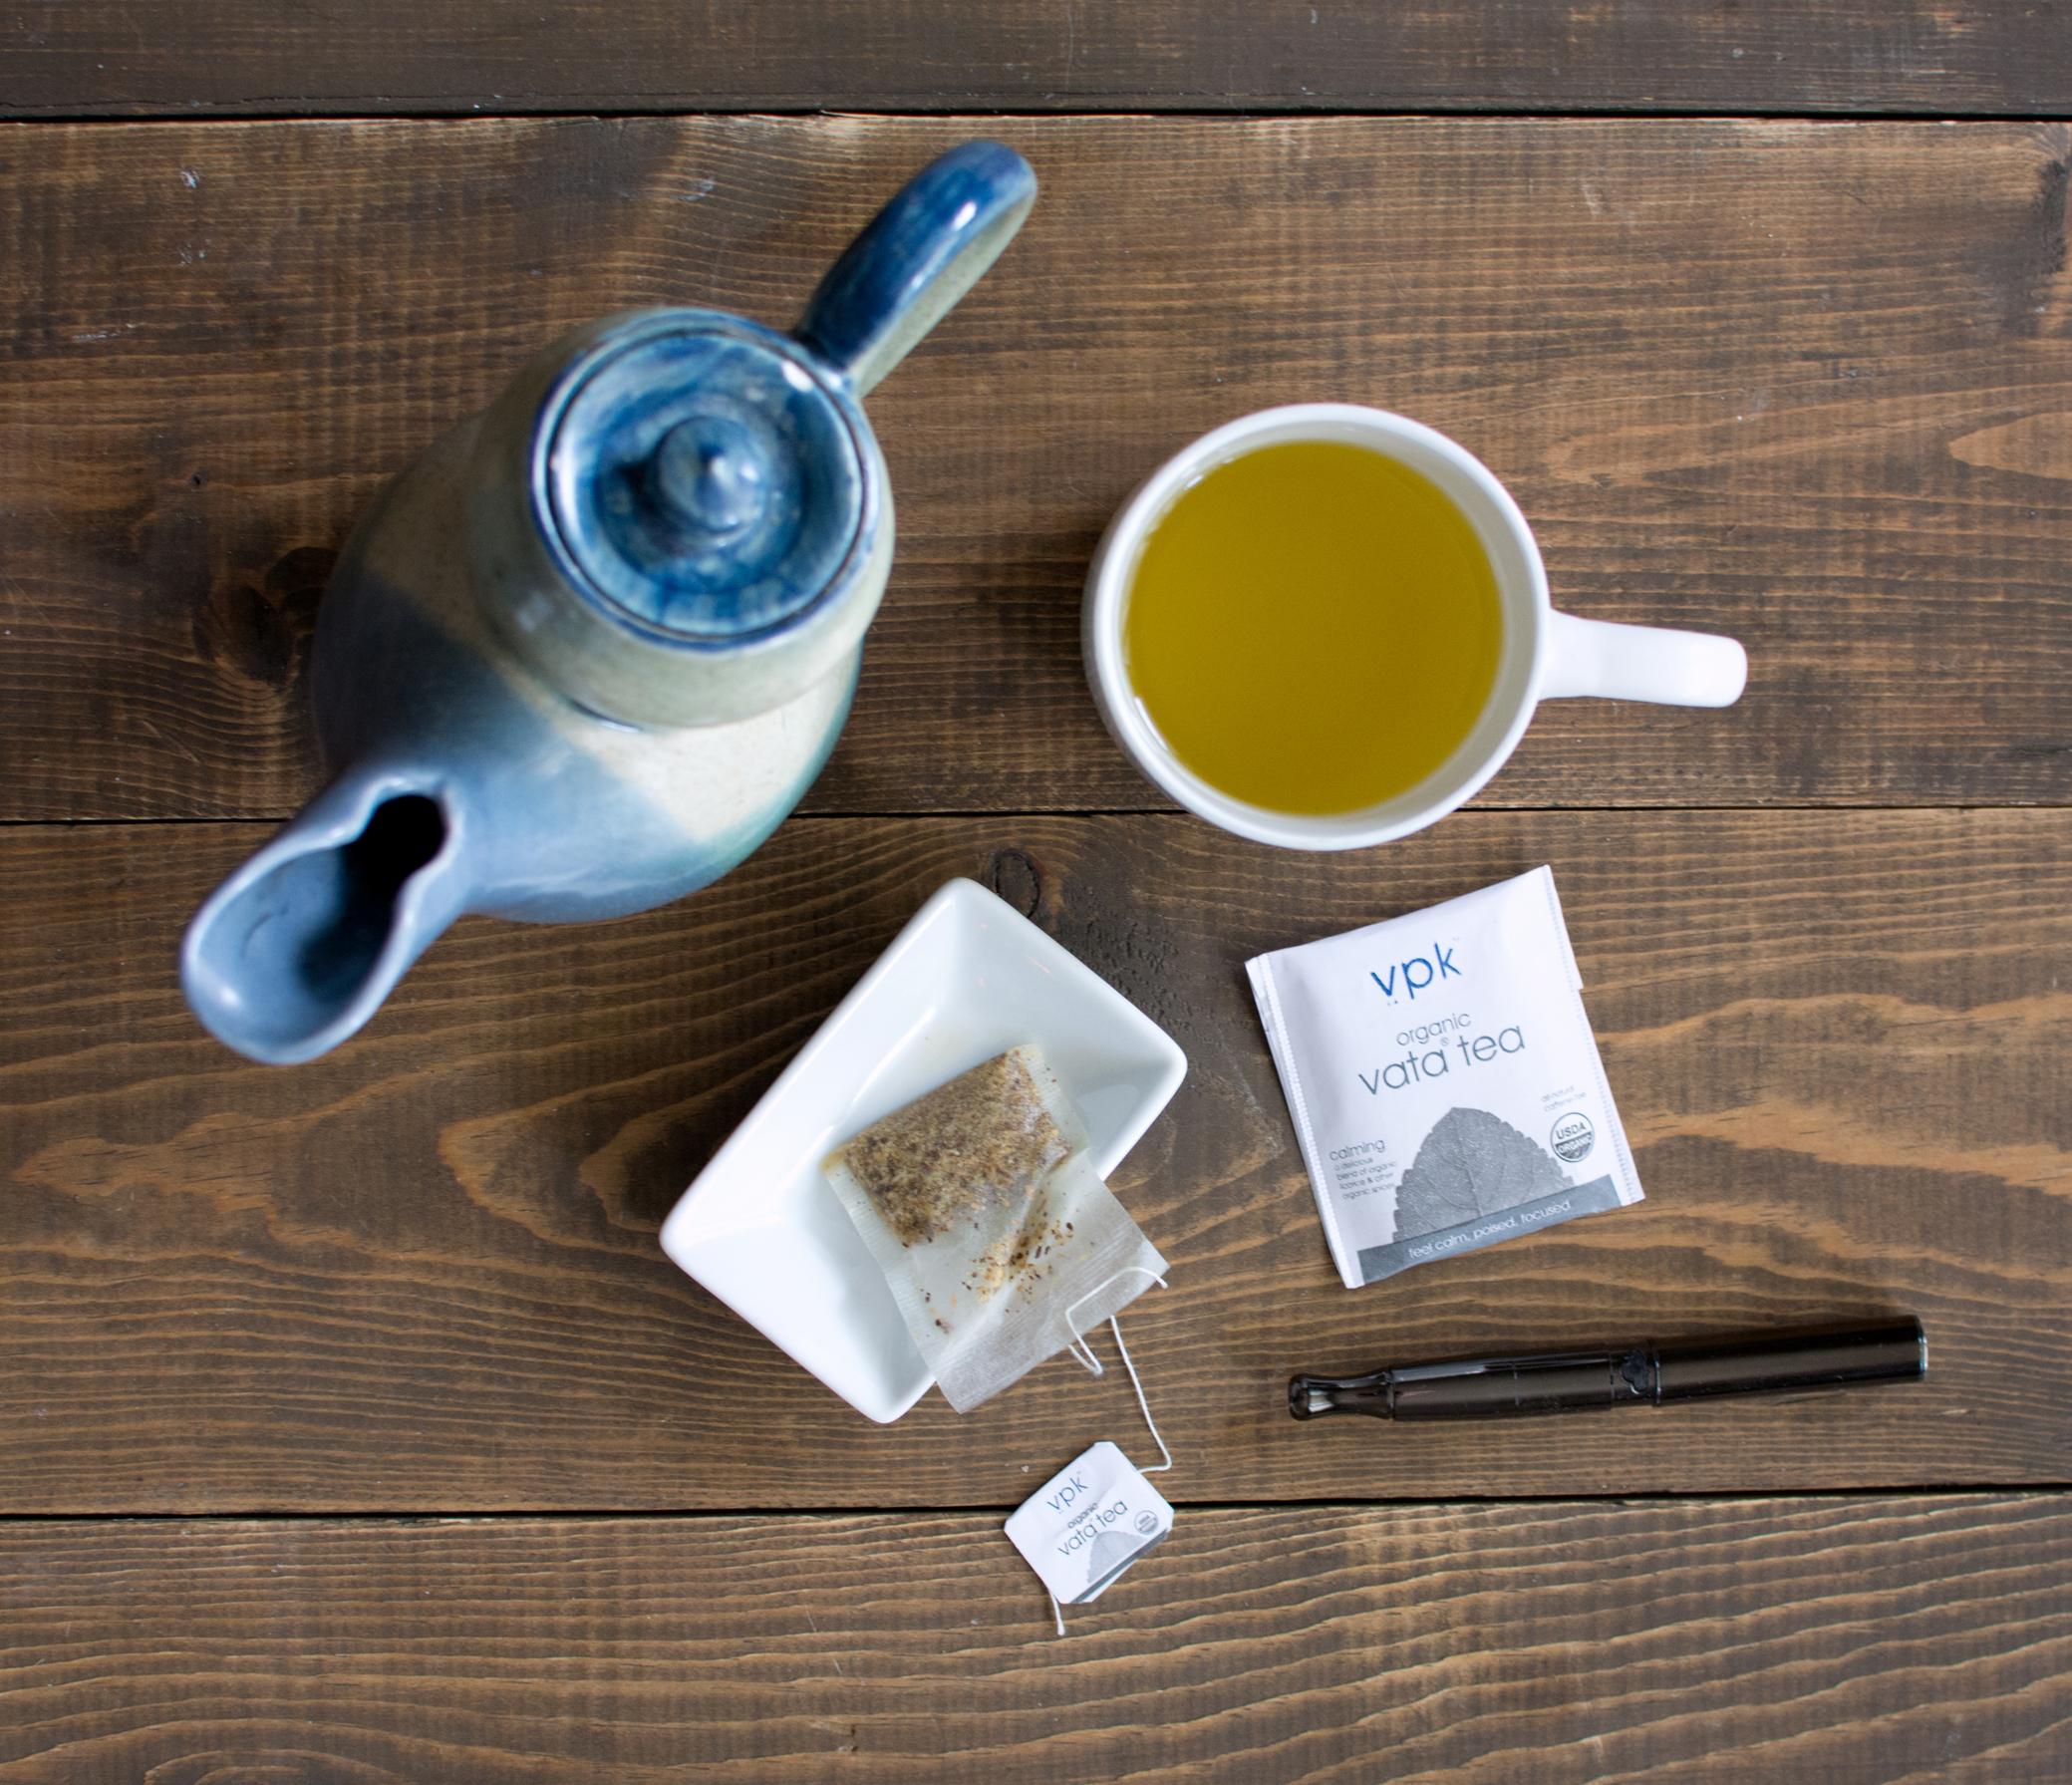 vata-tea-puffco.jpg